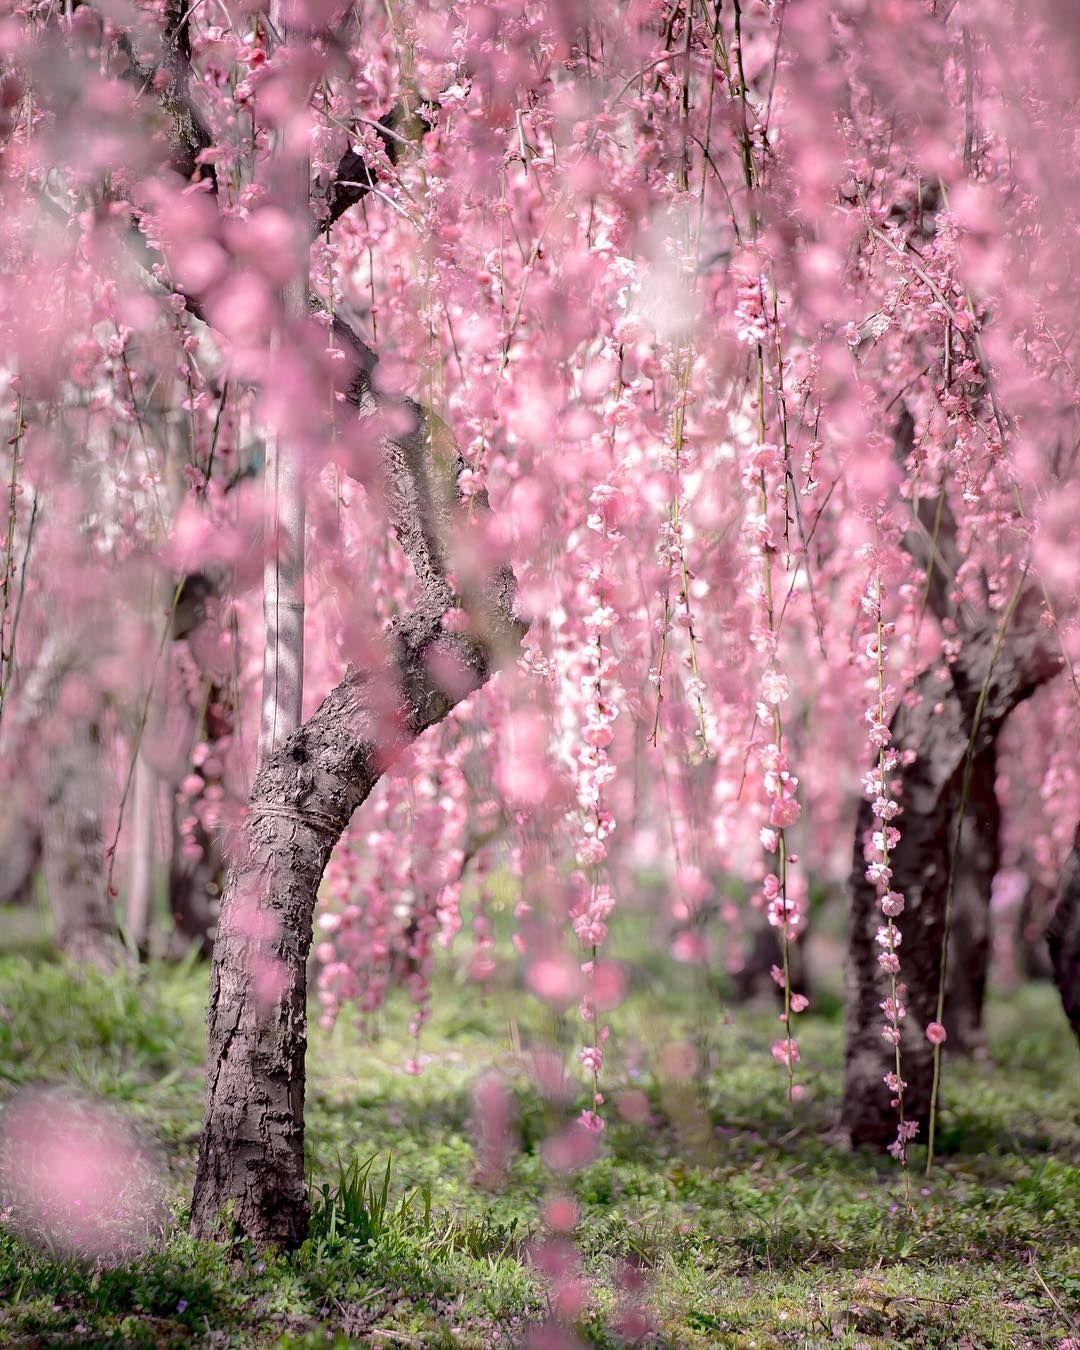 Weeping Cherry Trees By Takahiro Ito Takanii2015 On Instagram Cherry Trees Garden Cherry Tree Weeping Cherry Tree